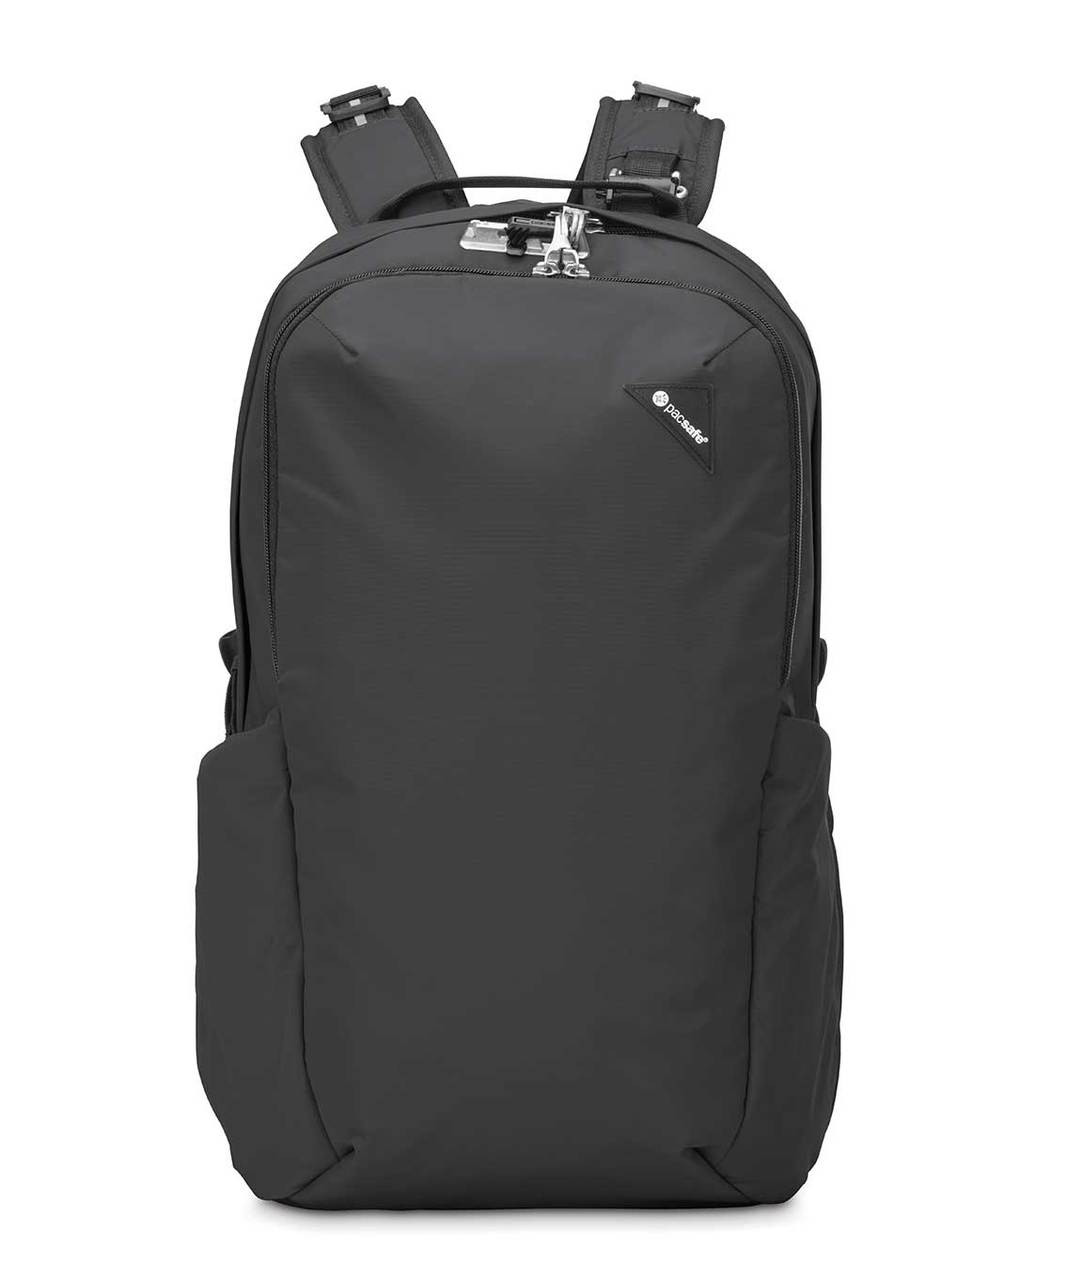 8b3d6e8e571a Travelon Bags Nz